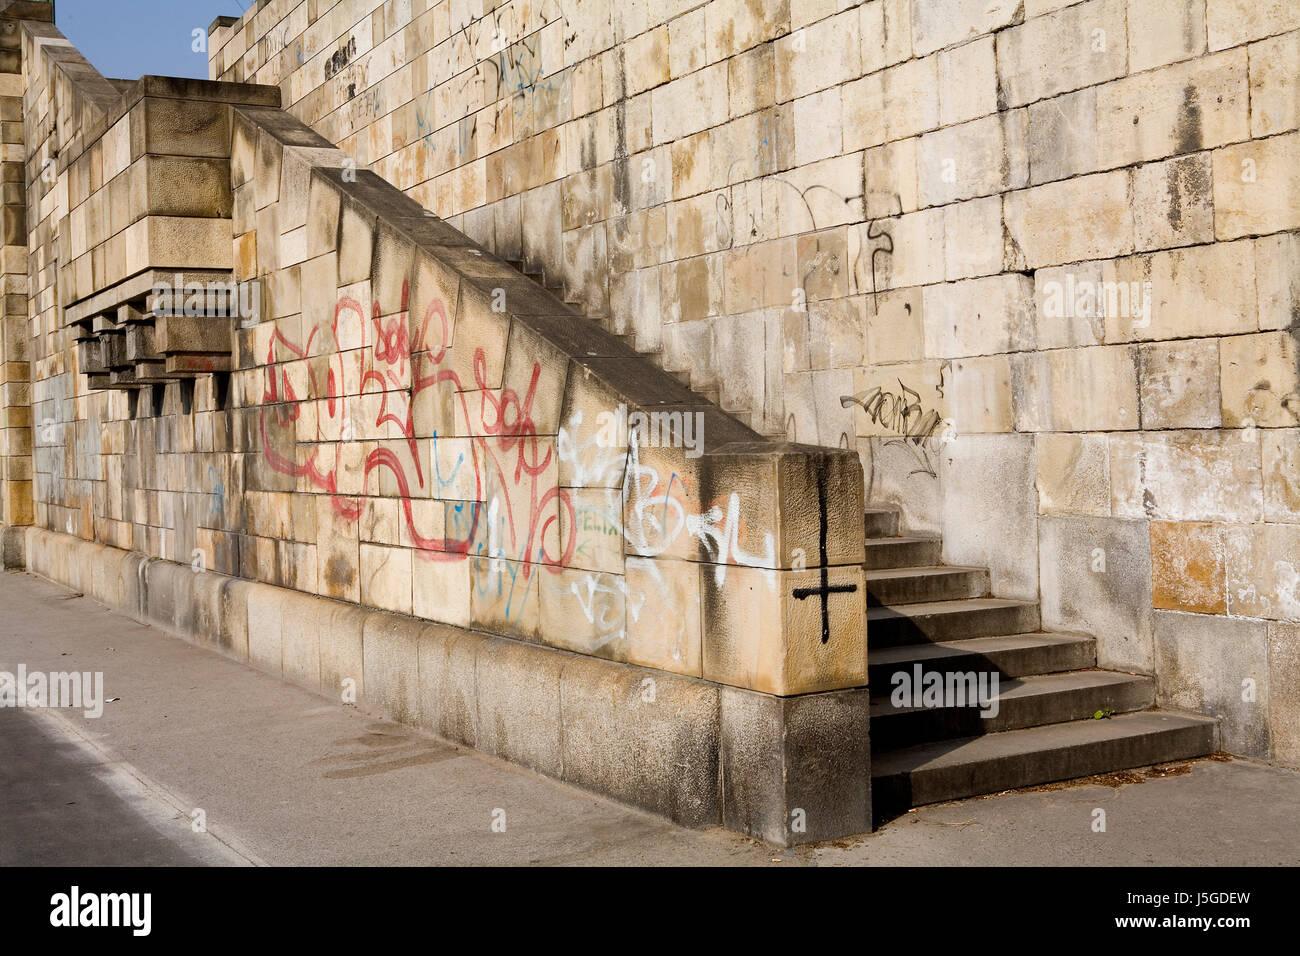 art vienna channel wall danube paint dock aerosol to paint blight artist Stock Photo